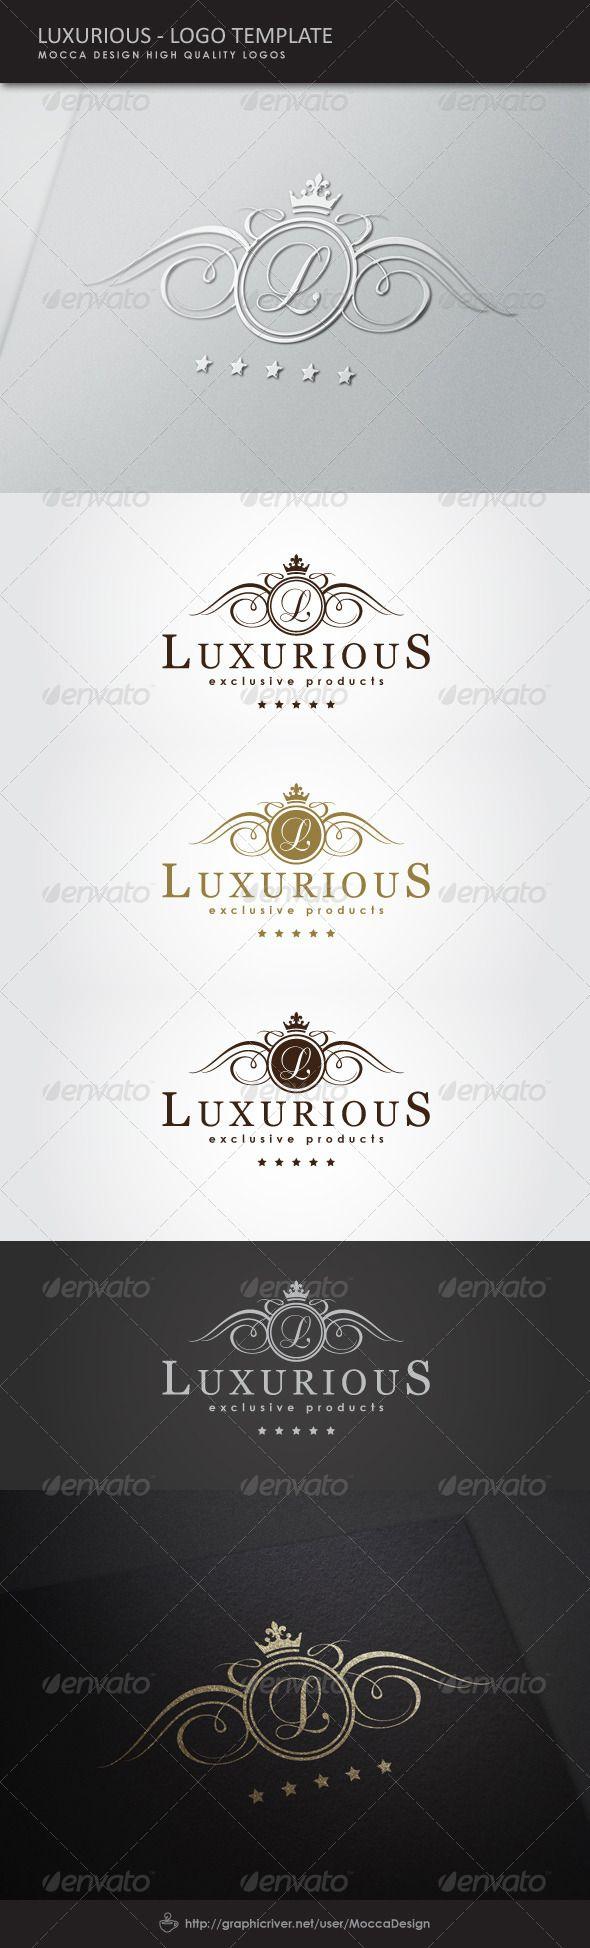 Luxurious Logo Template Vector EPS, AI Illustrator. Download here: https://graphicriver.net/item/luxurious-logo/5170308?ref=ksioks